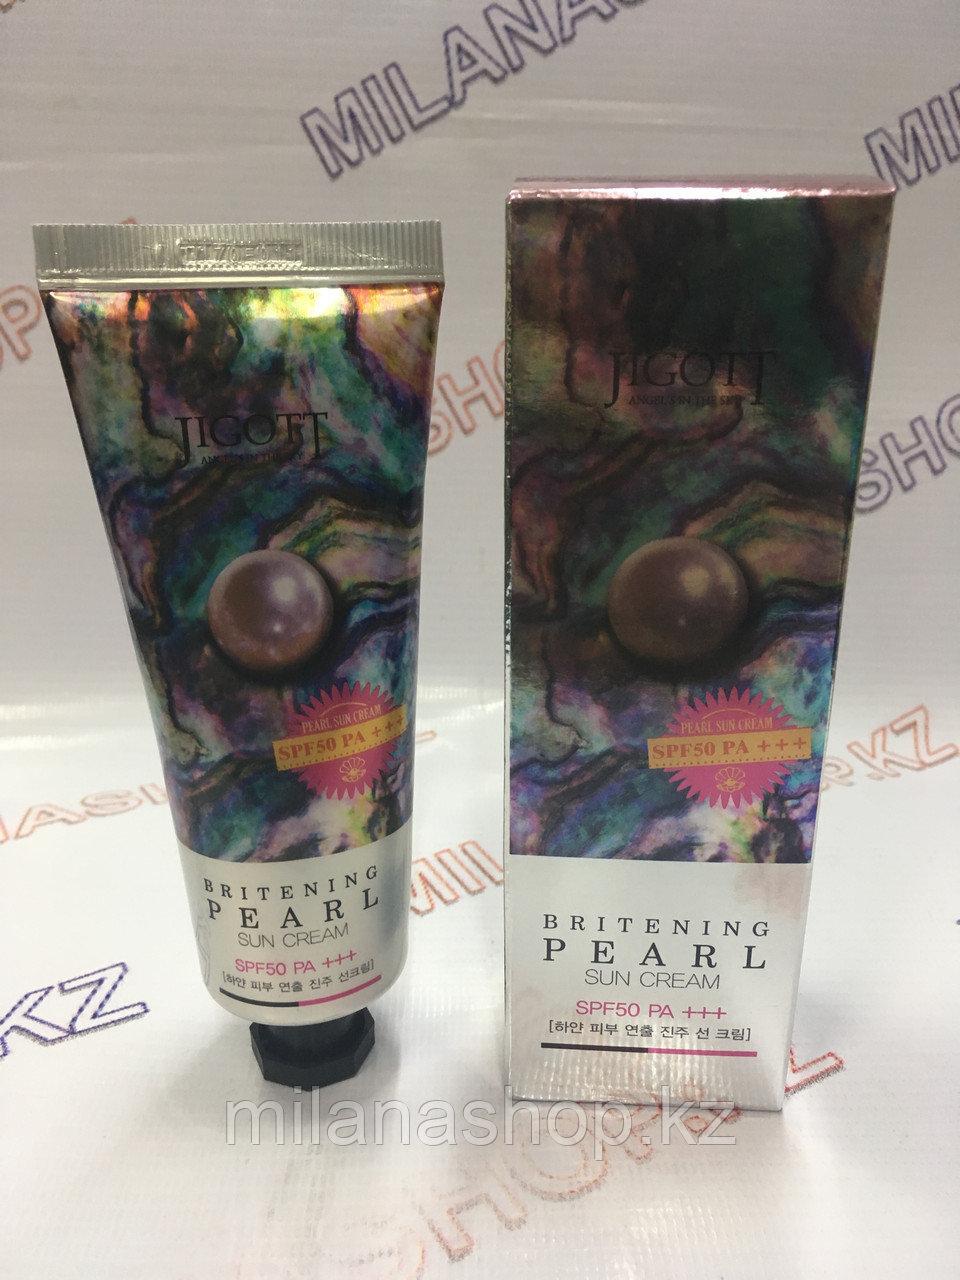 Jigott Brightening Pearl Sun Cream SPF 50 -  Солнцезащитный крем с жемчужной пудрой